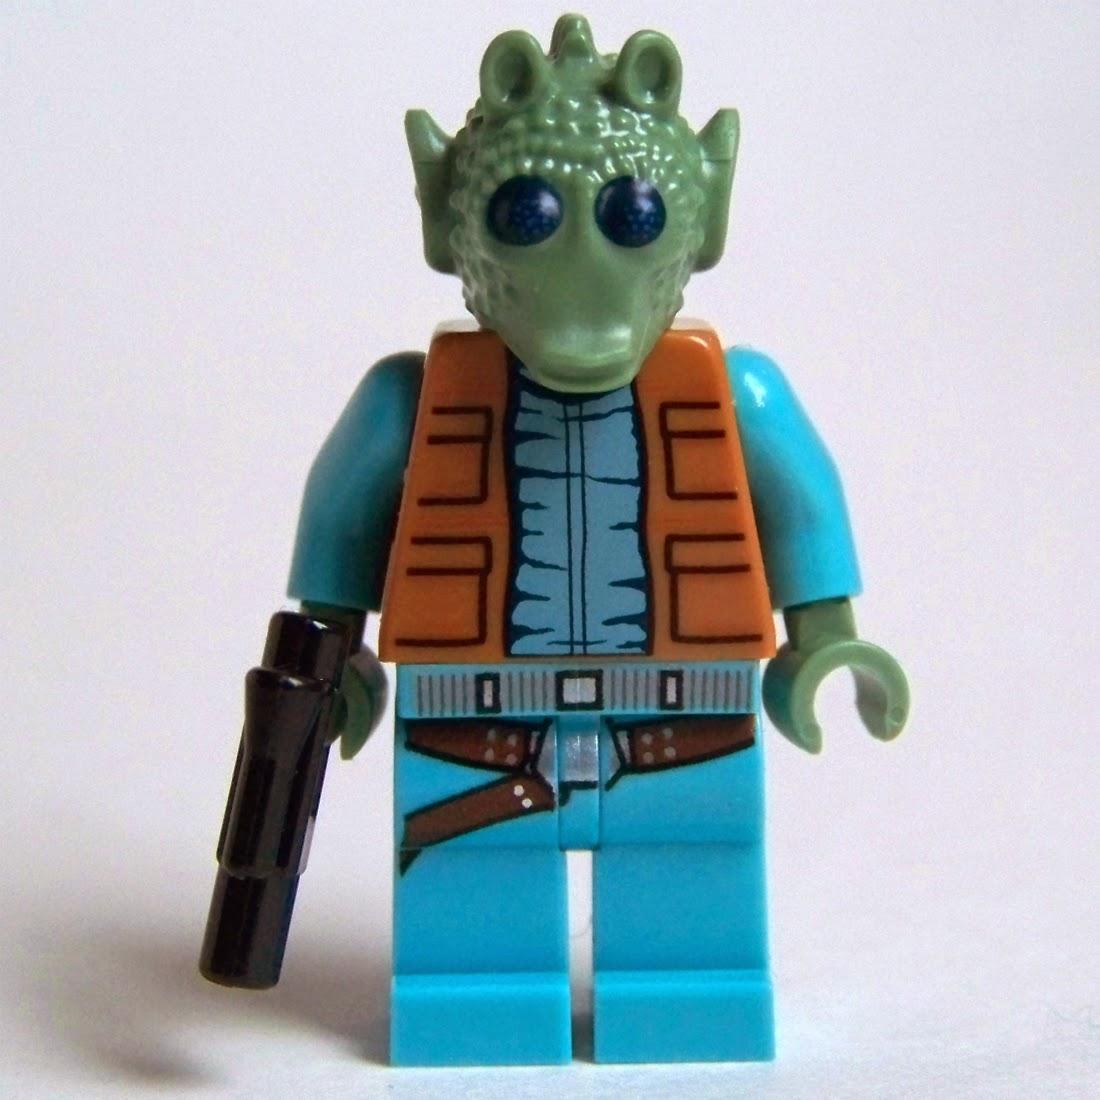 LEGO Greedo Cantina